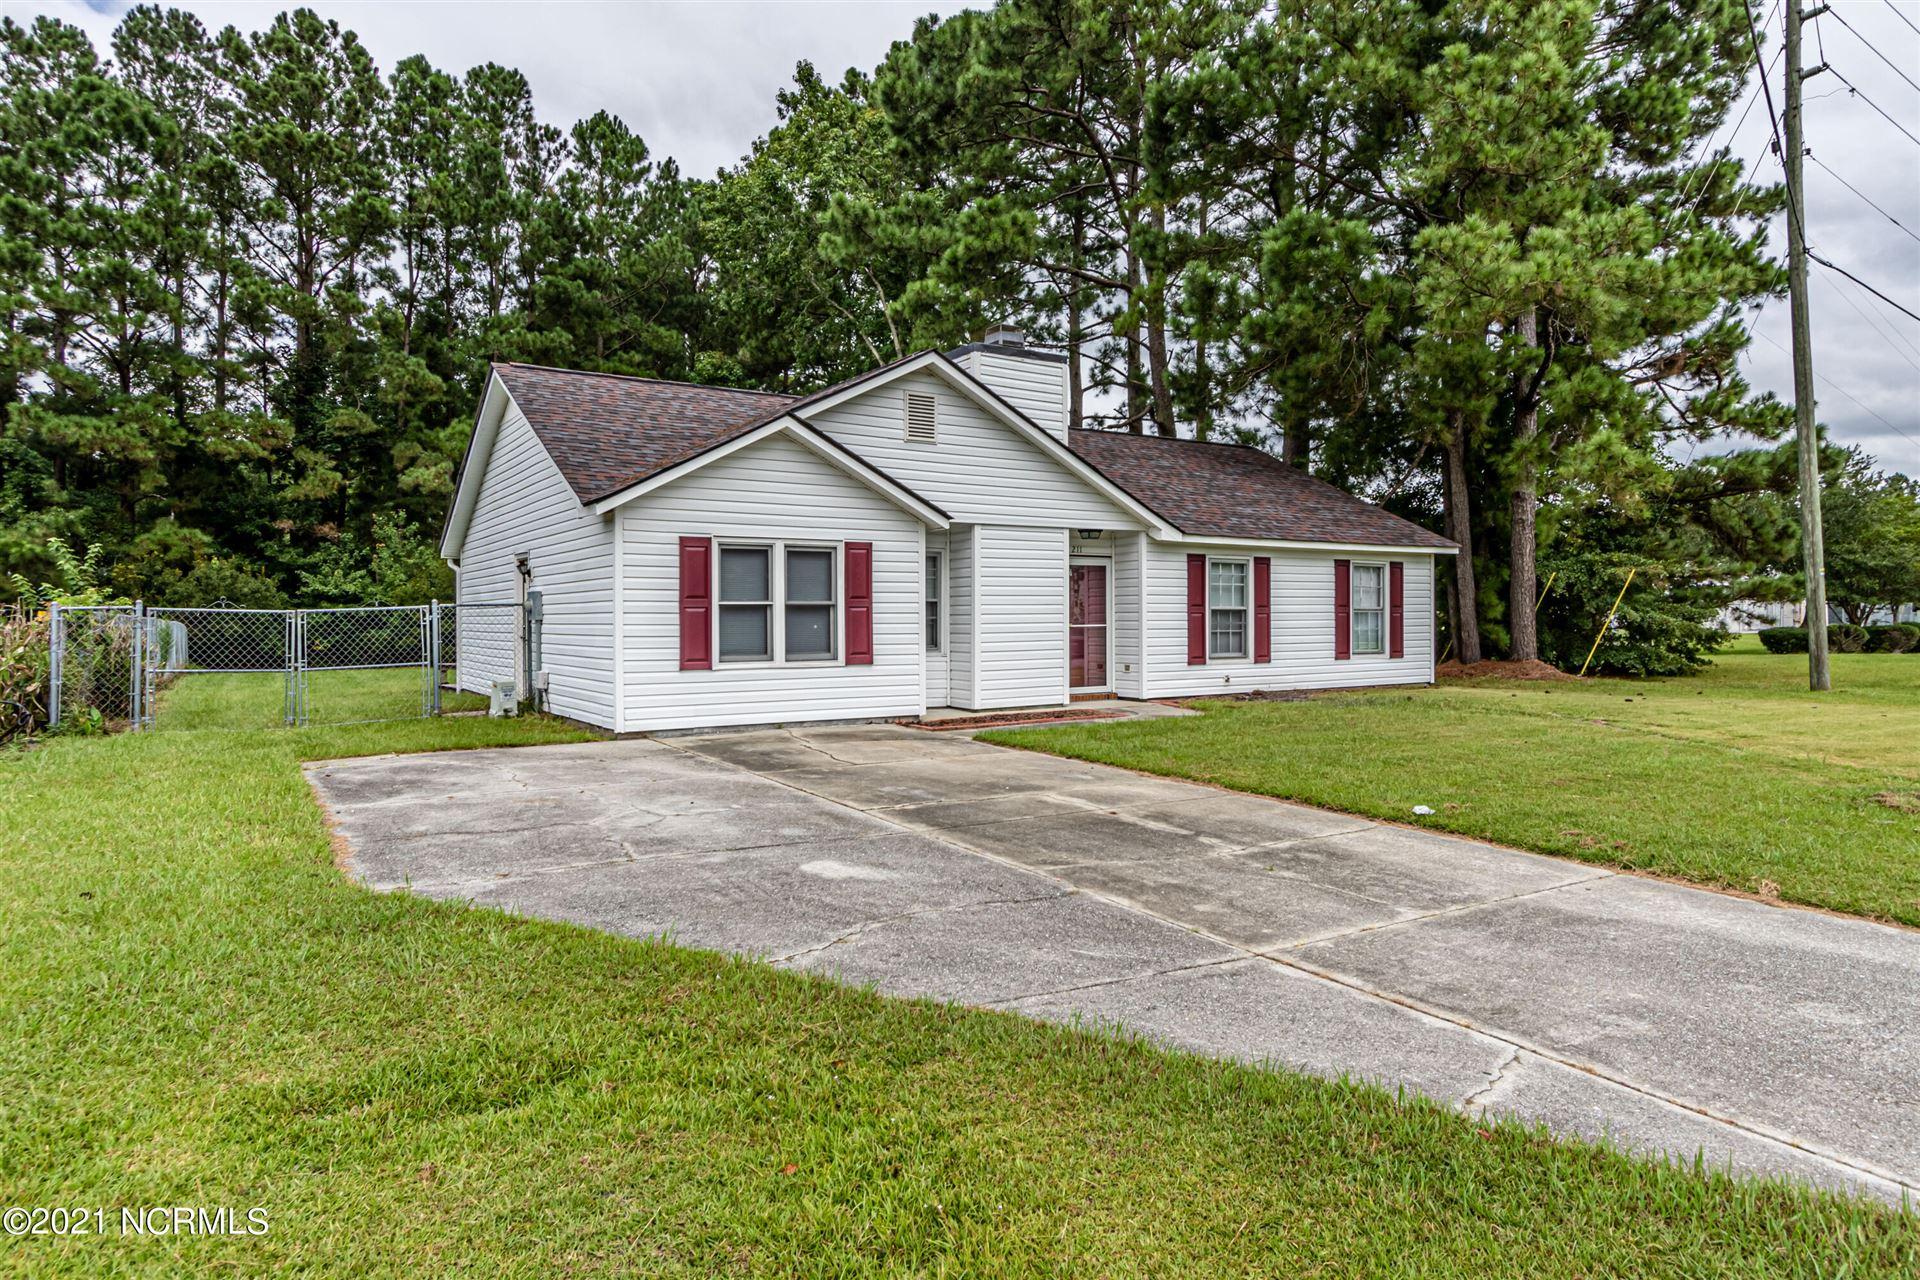 Photo of 211 Hunting Green Drive, Jacksonville, NC 28546 (MLS # 100290971)